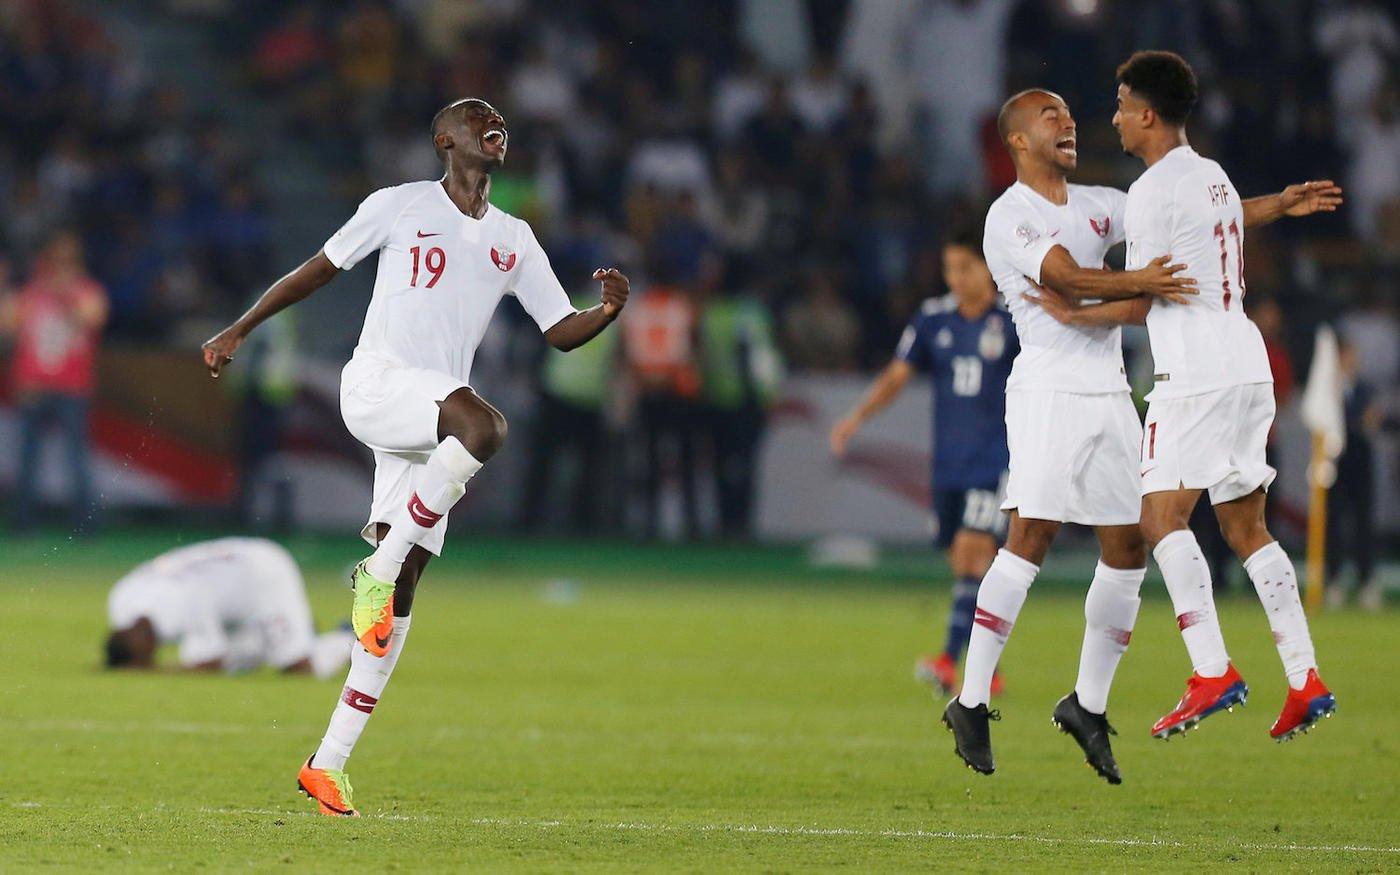 Qatar football team beat Japan to win their first ever Asian